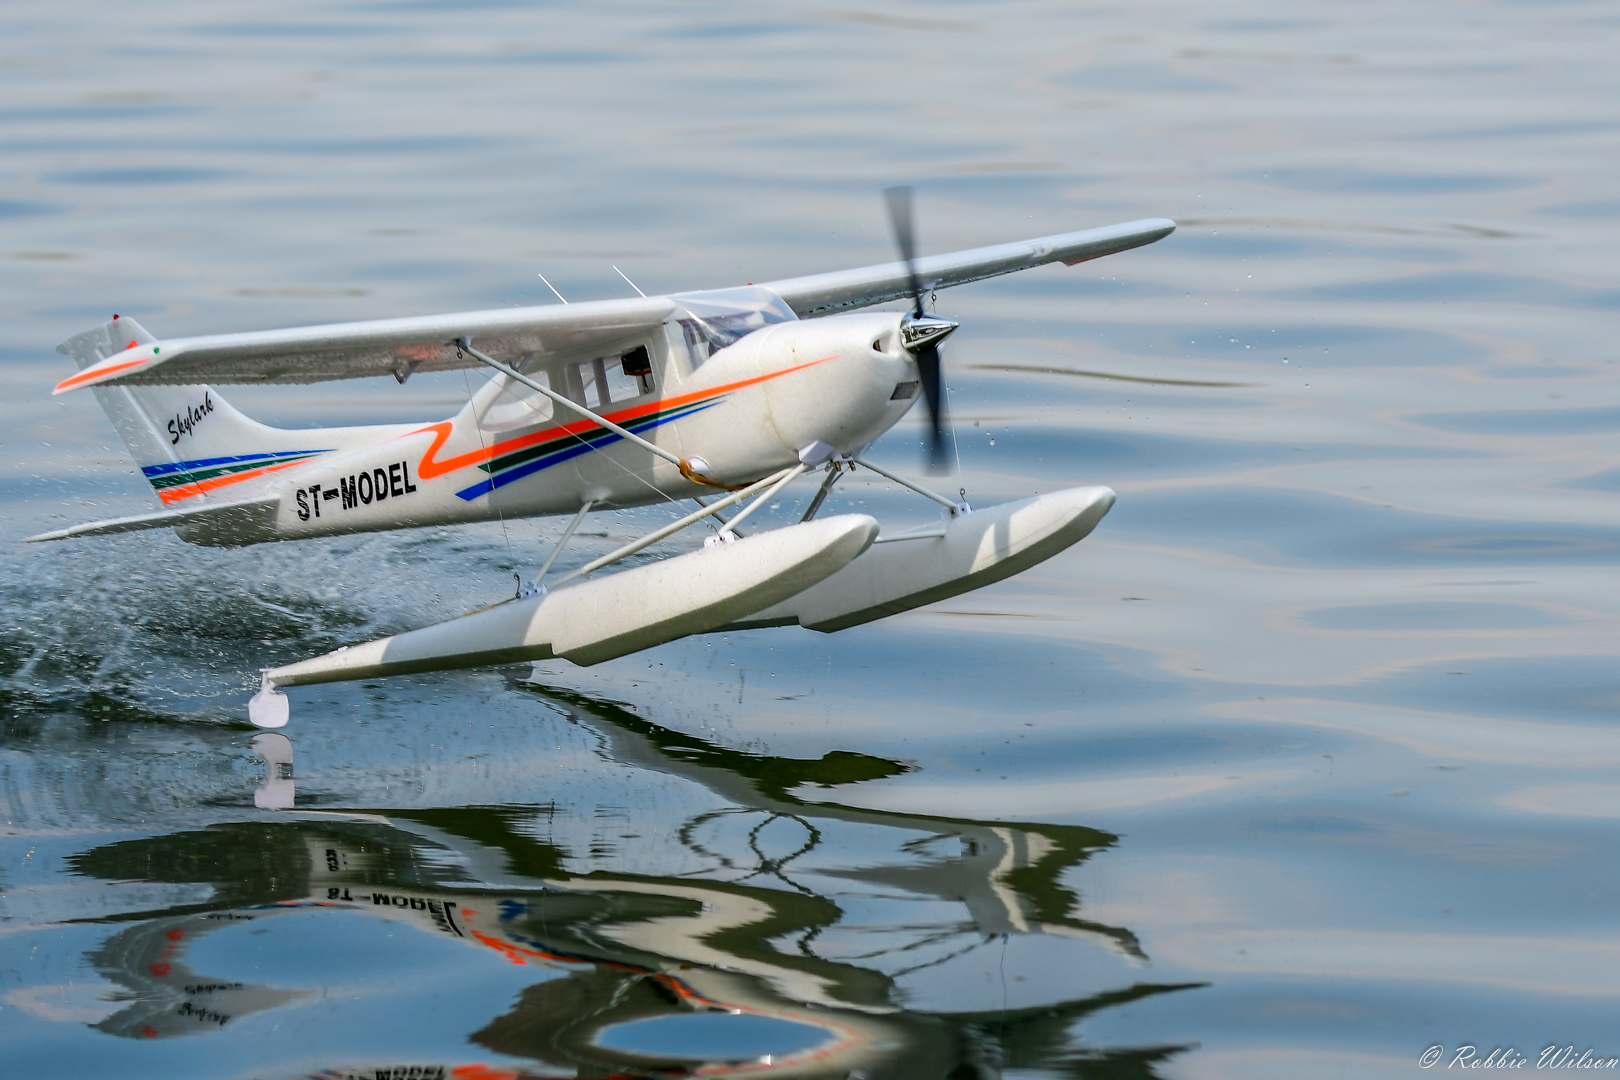 Martin Venter's Cessna